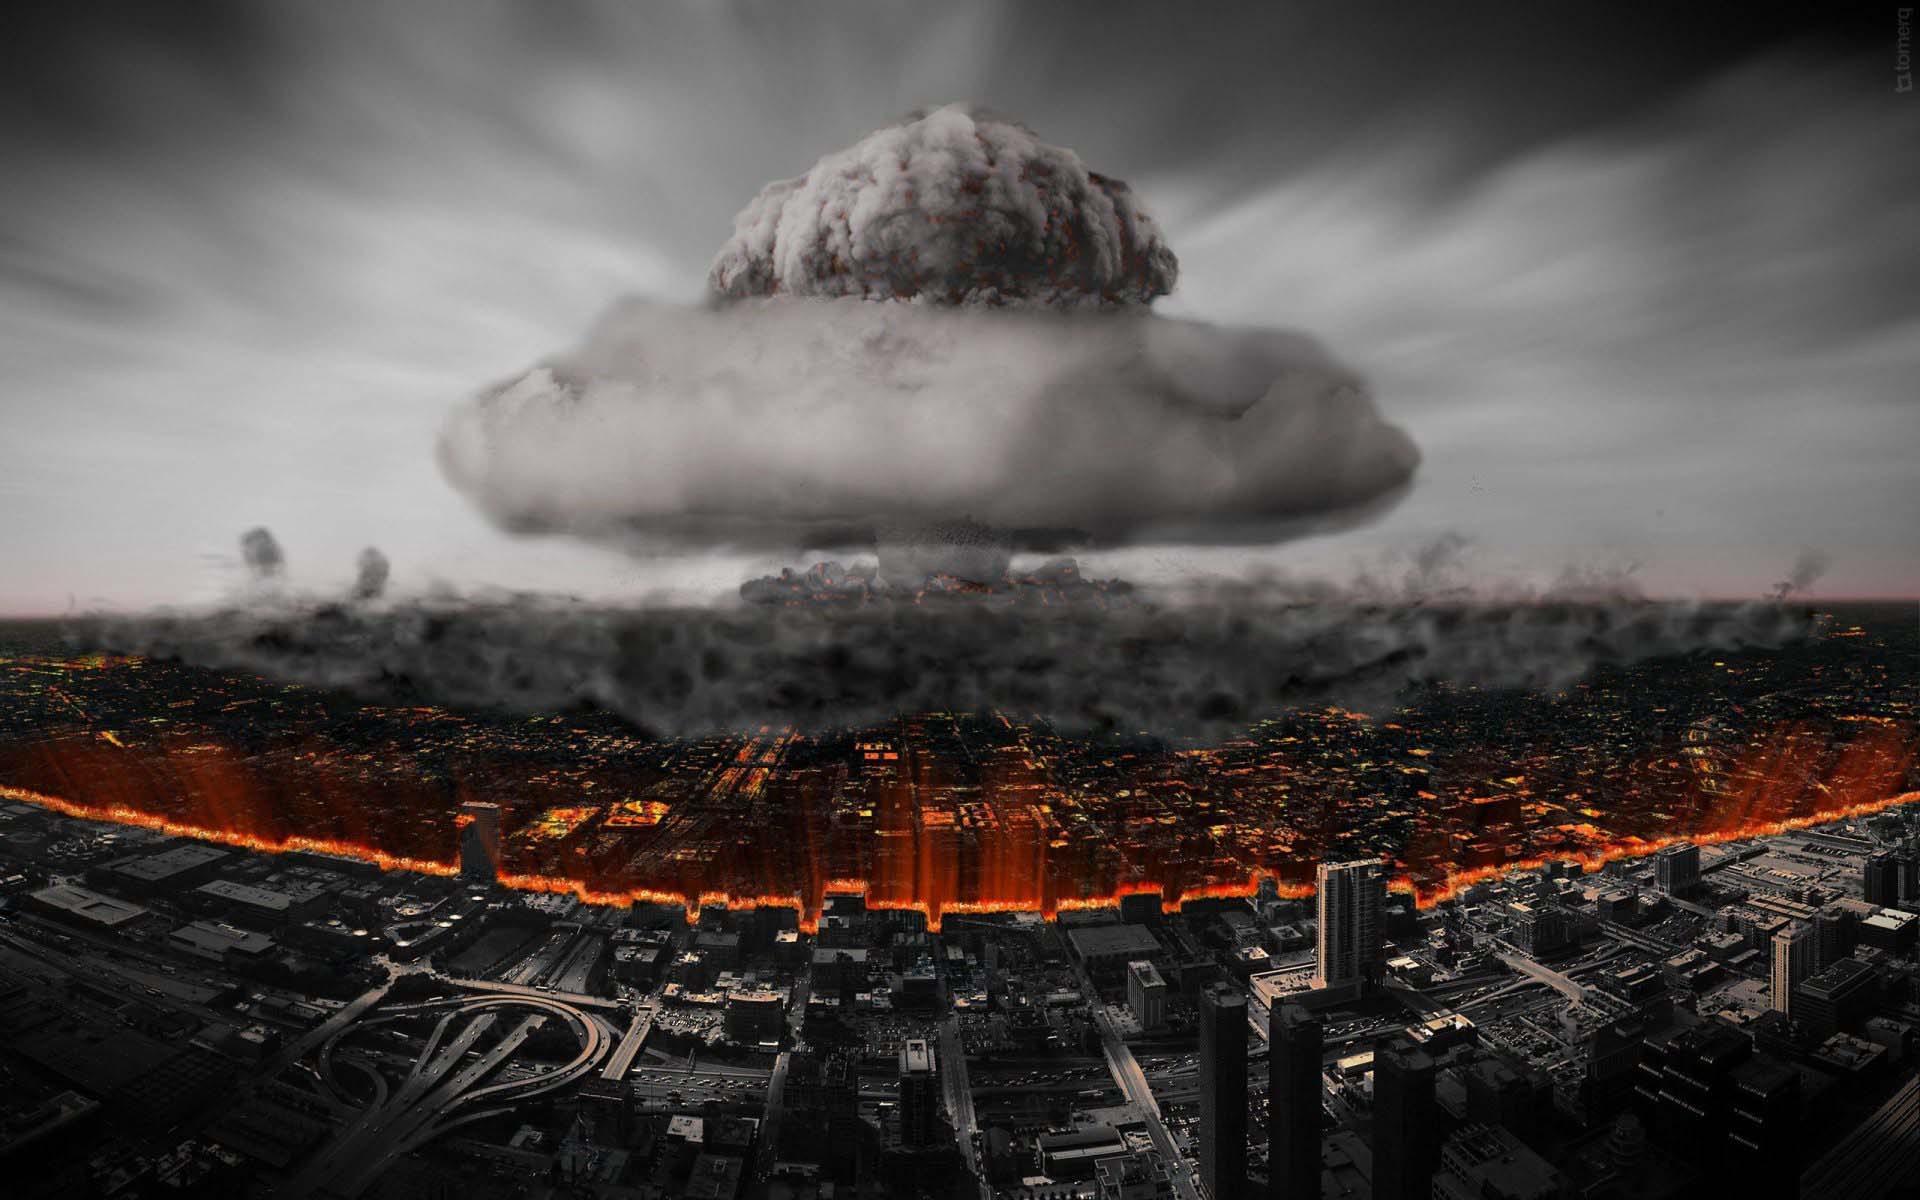 What will happen in September 2015?